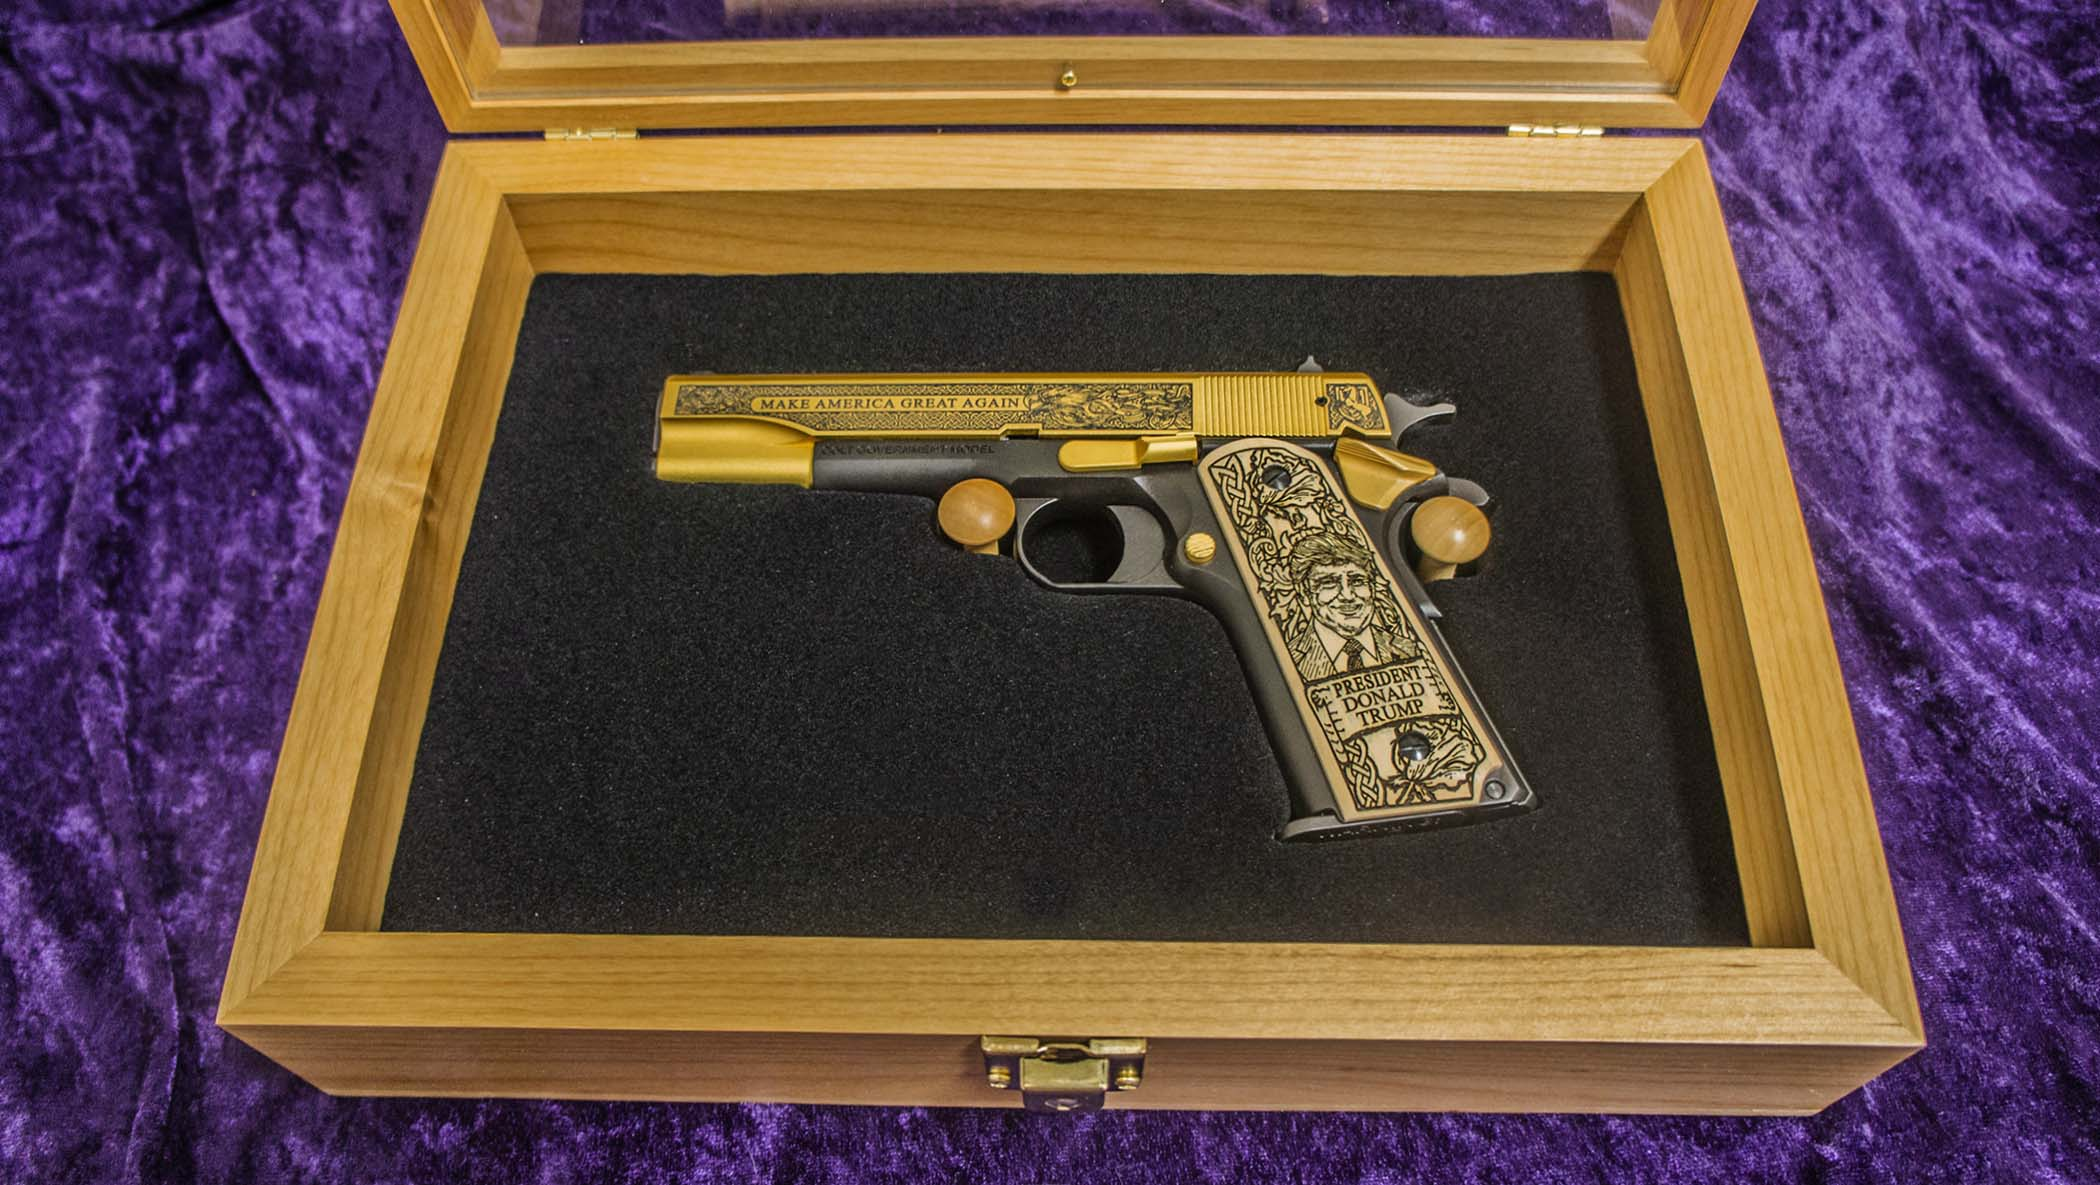 Alder Wood Display Box